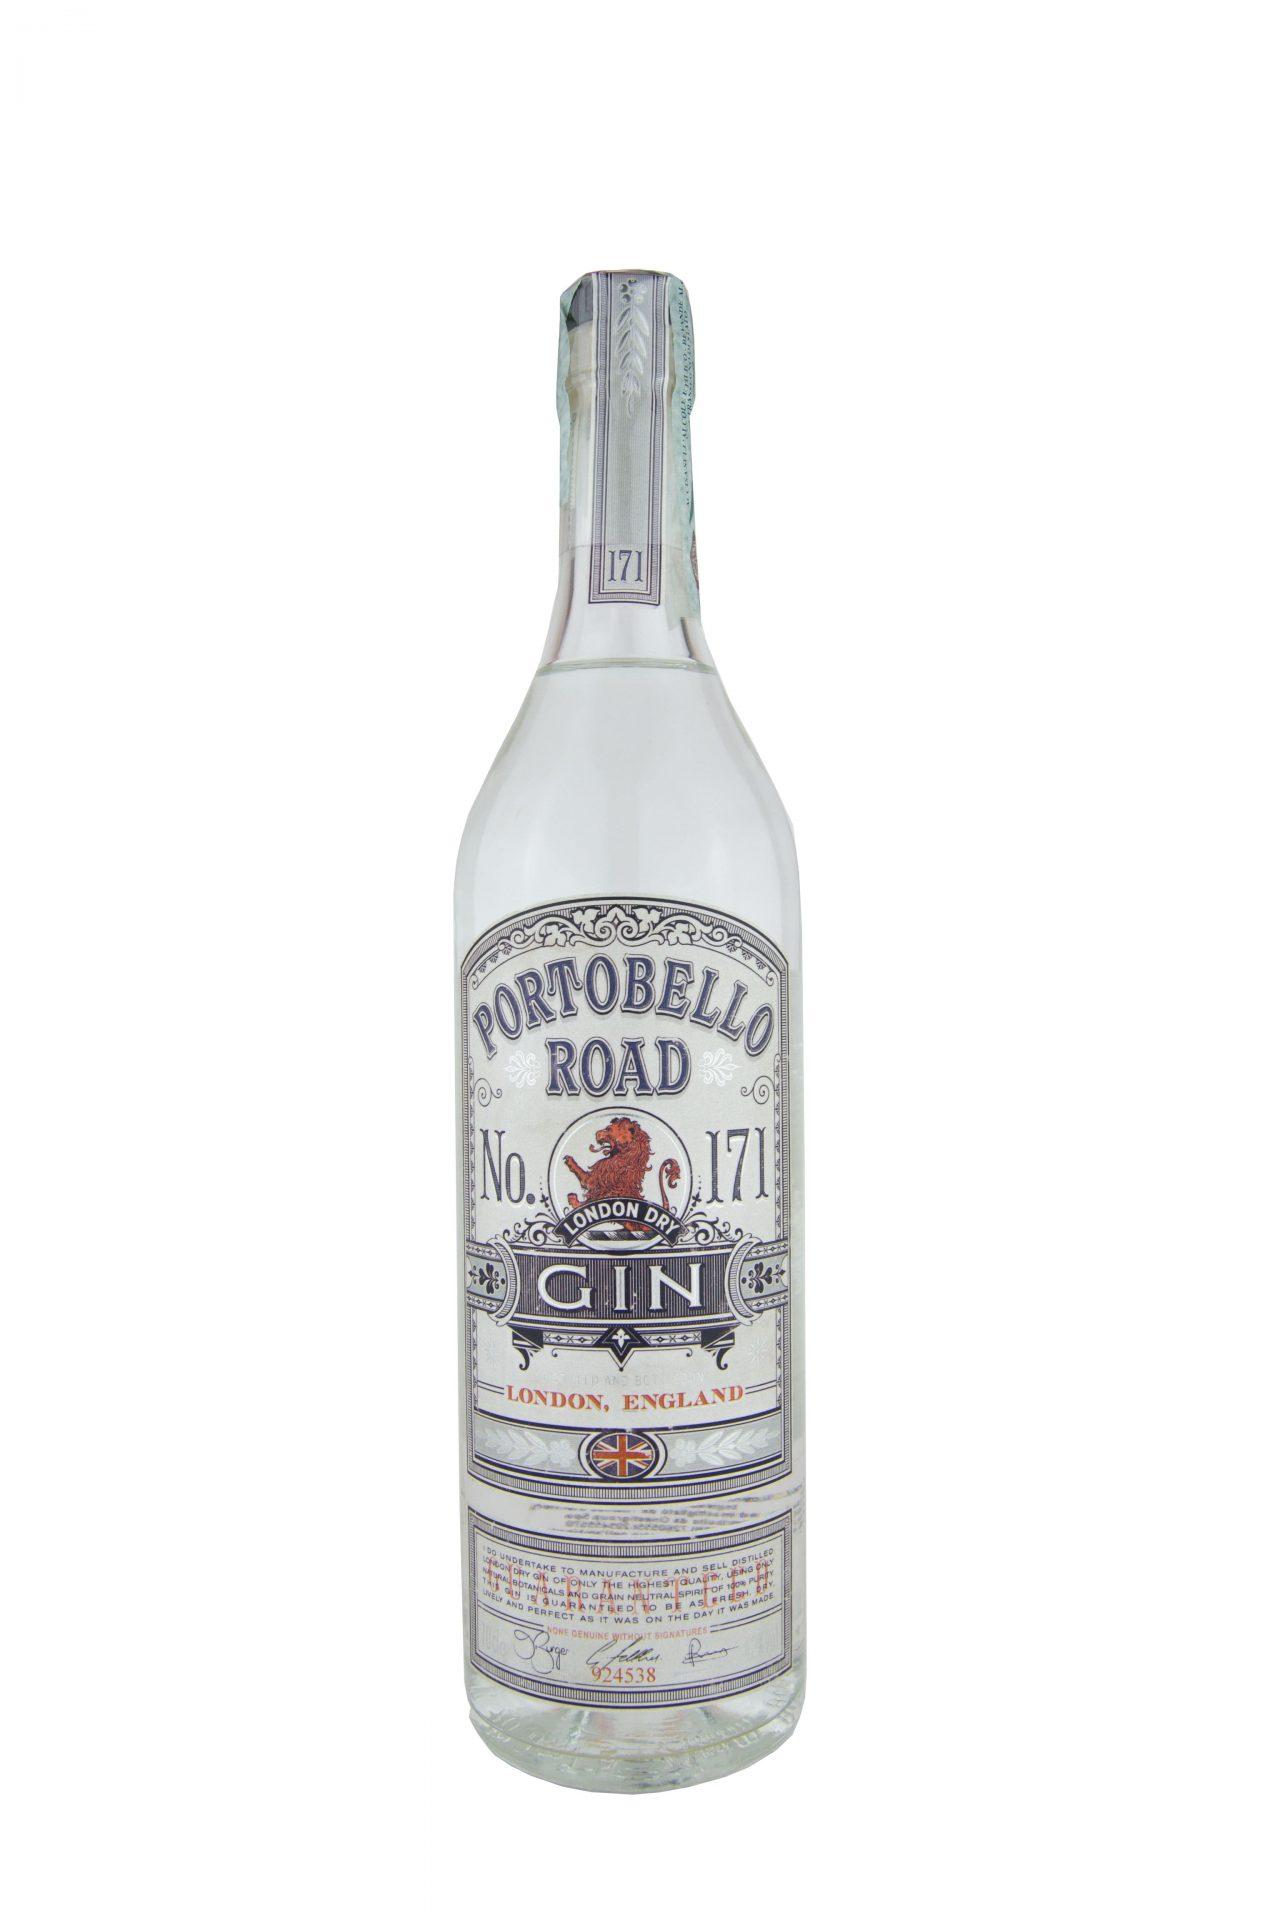 Portobello Road – N° 171 Gin